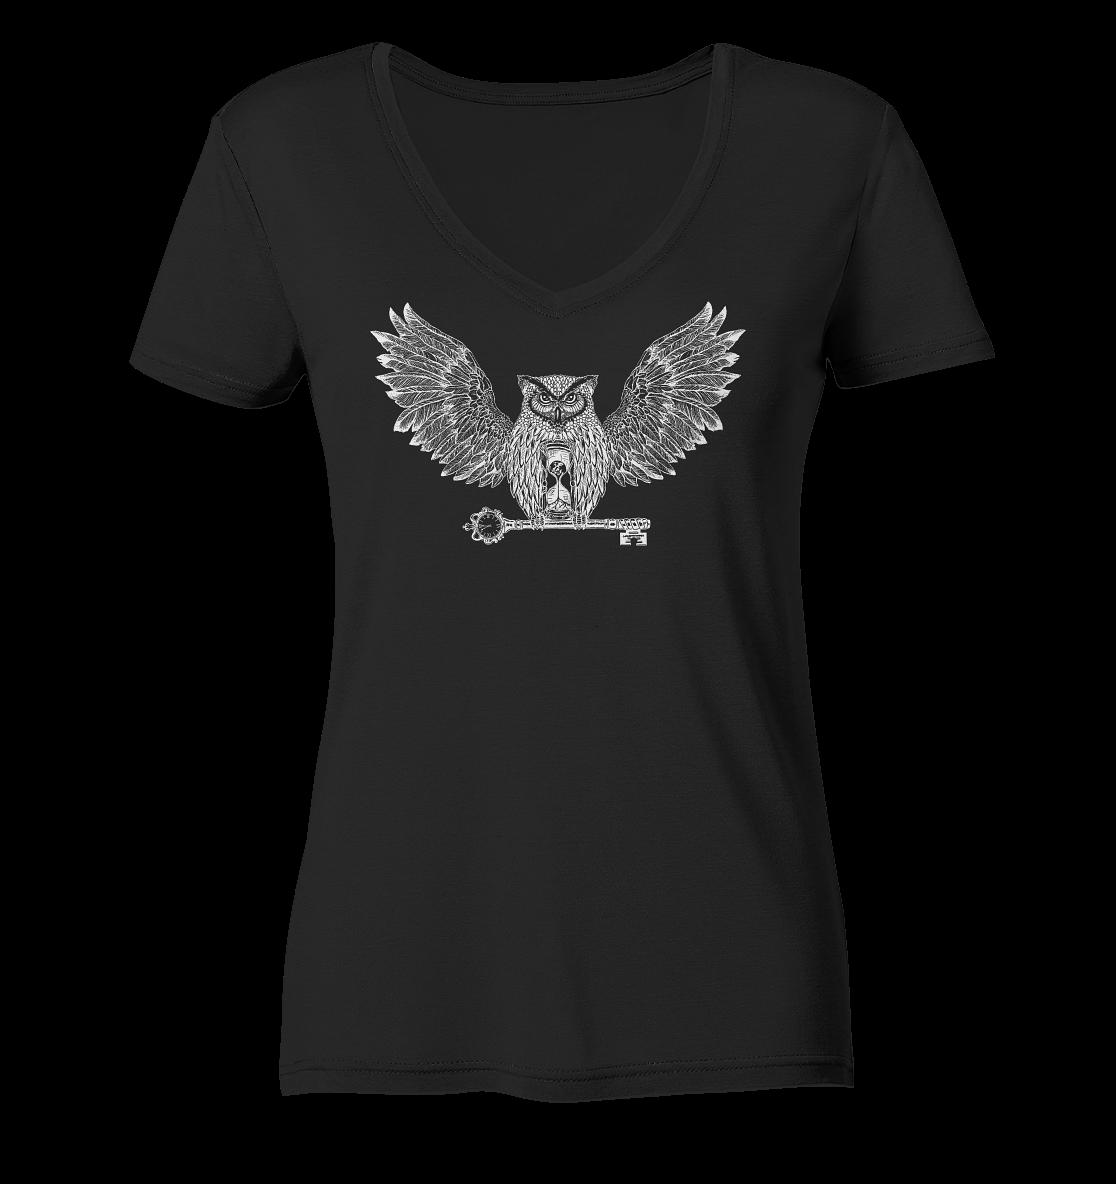 front-ladies-organic-v-neck-shirt-272727-1116x-2.png